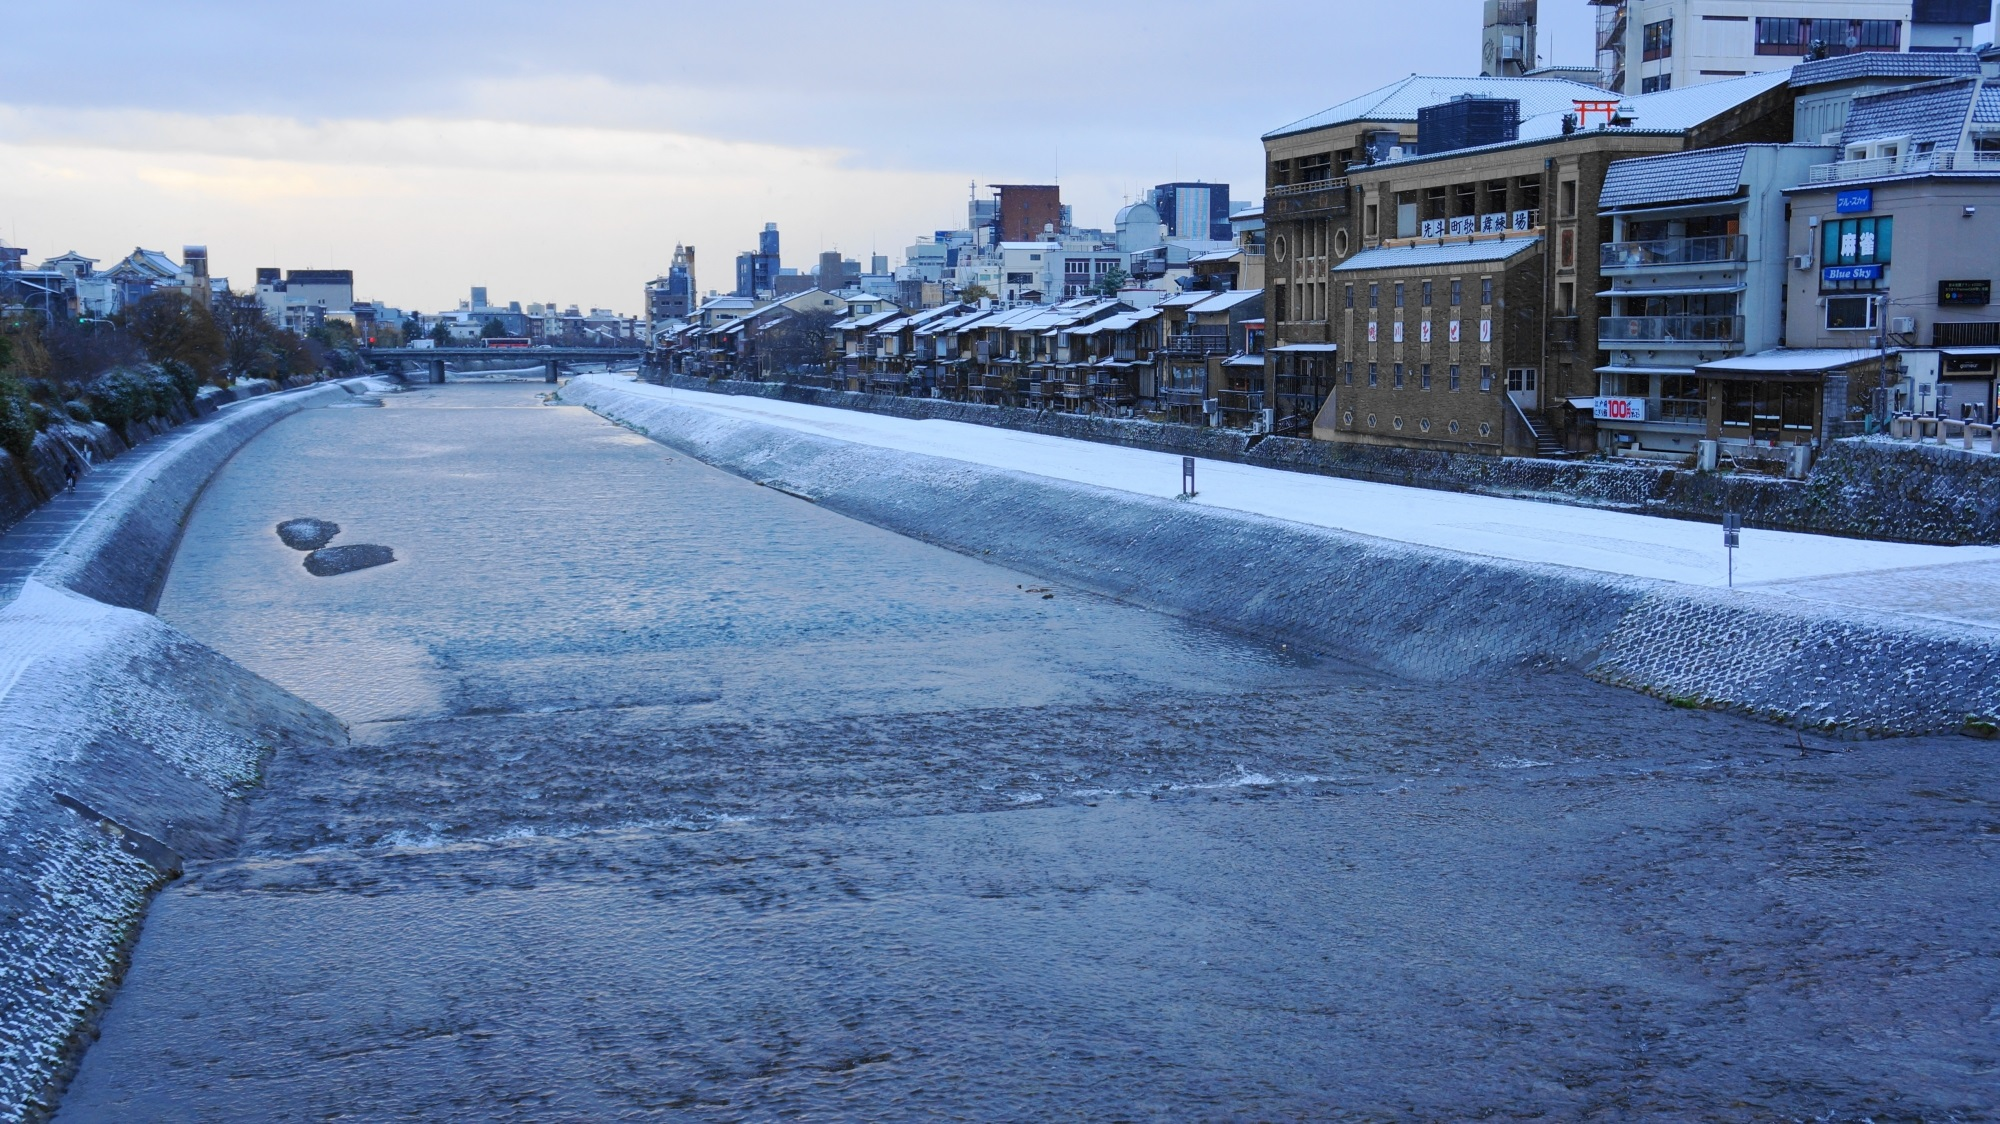 京都鴨川の三条大橋付近の綺麗な雪景色